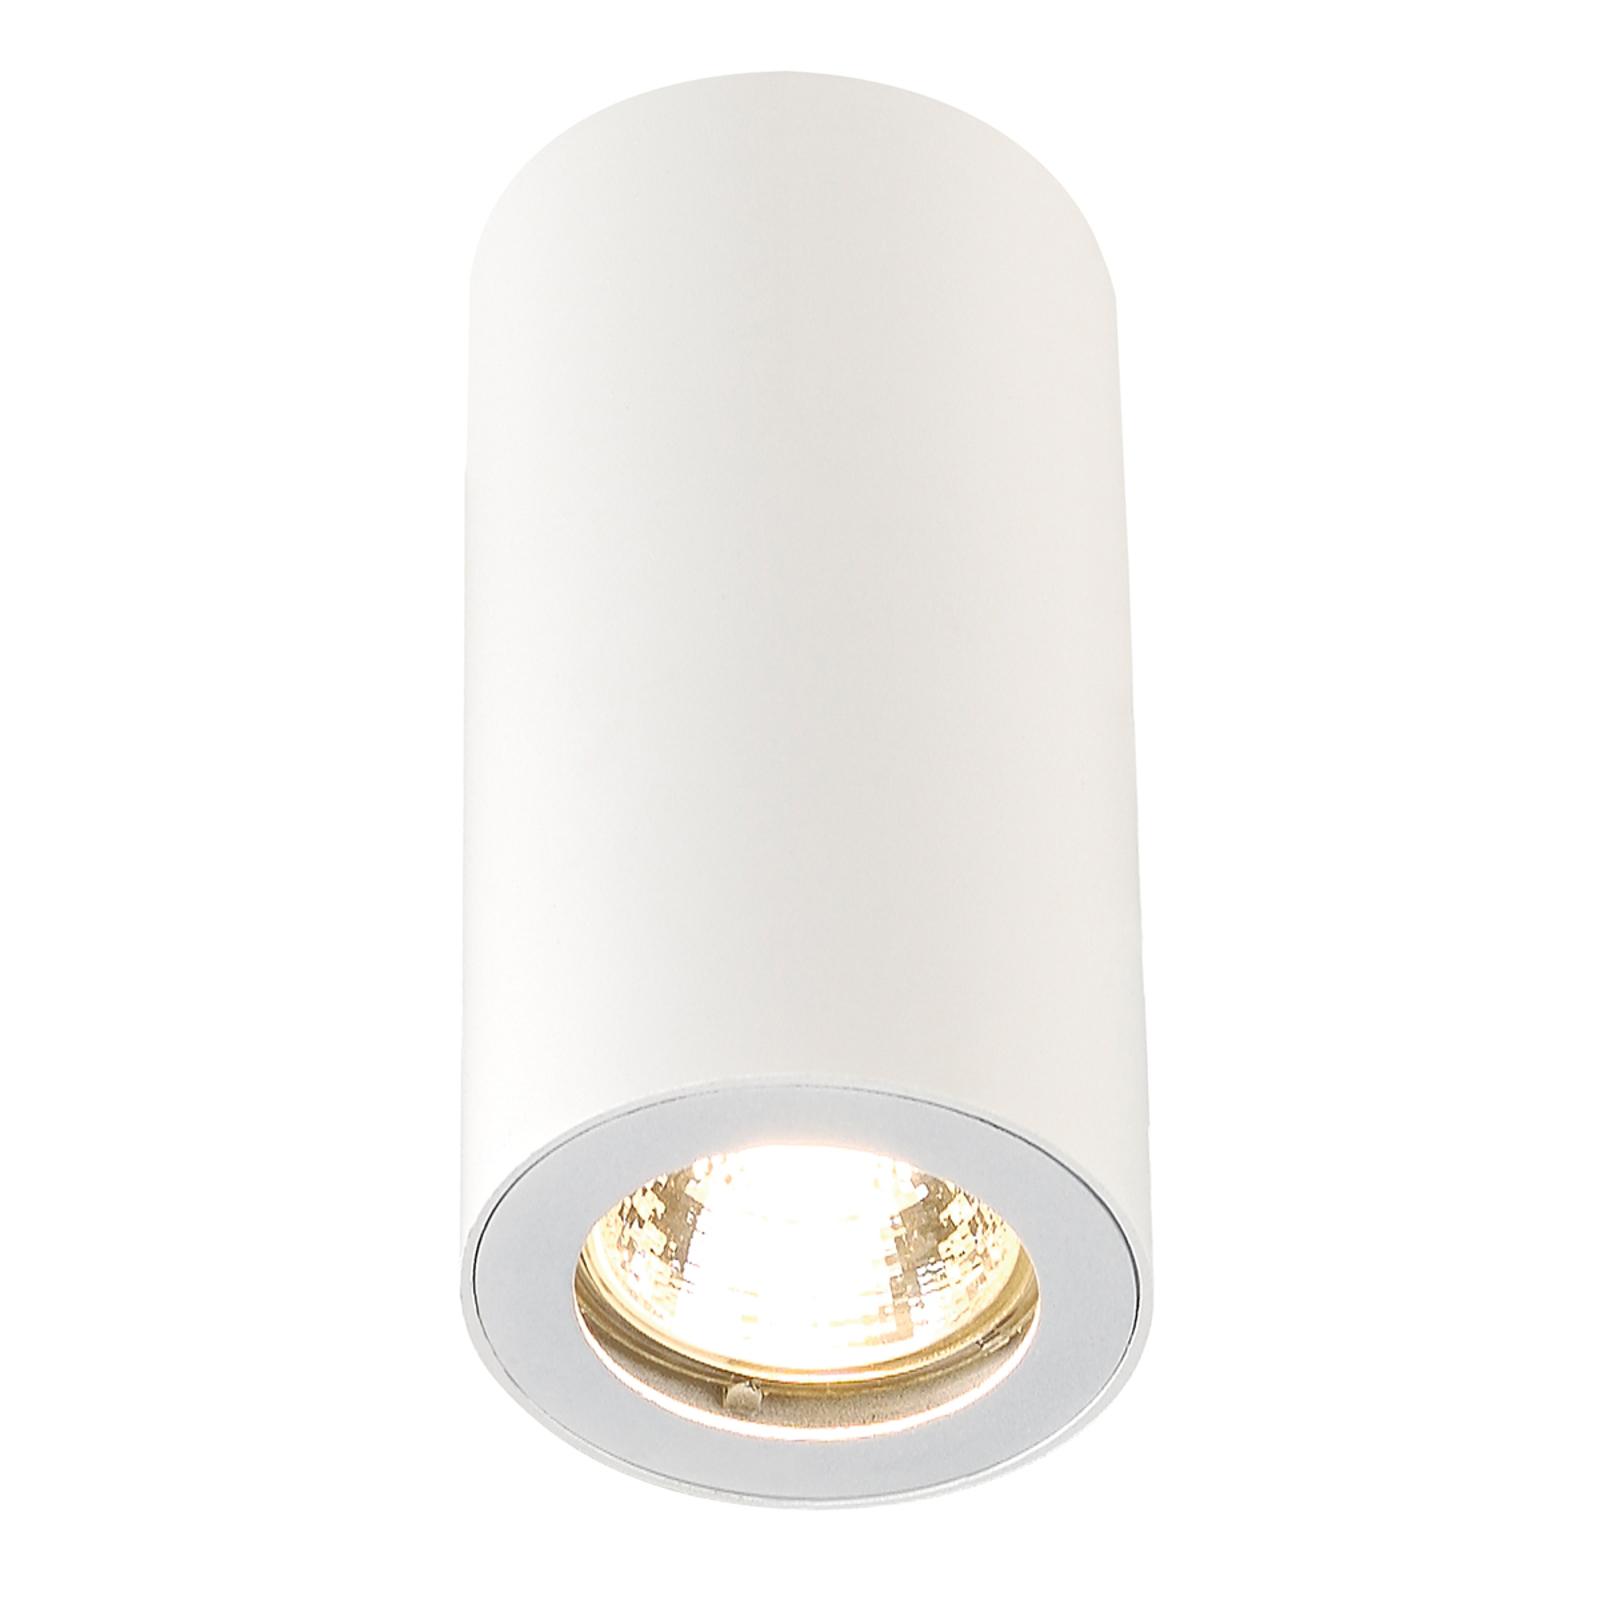 1-punktowy reflektor sufitowy ENOLA_B CL-1, biały